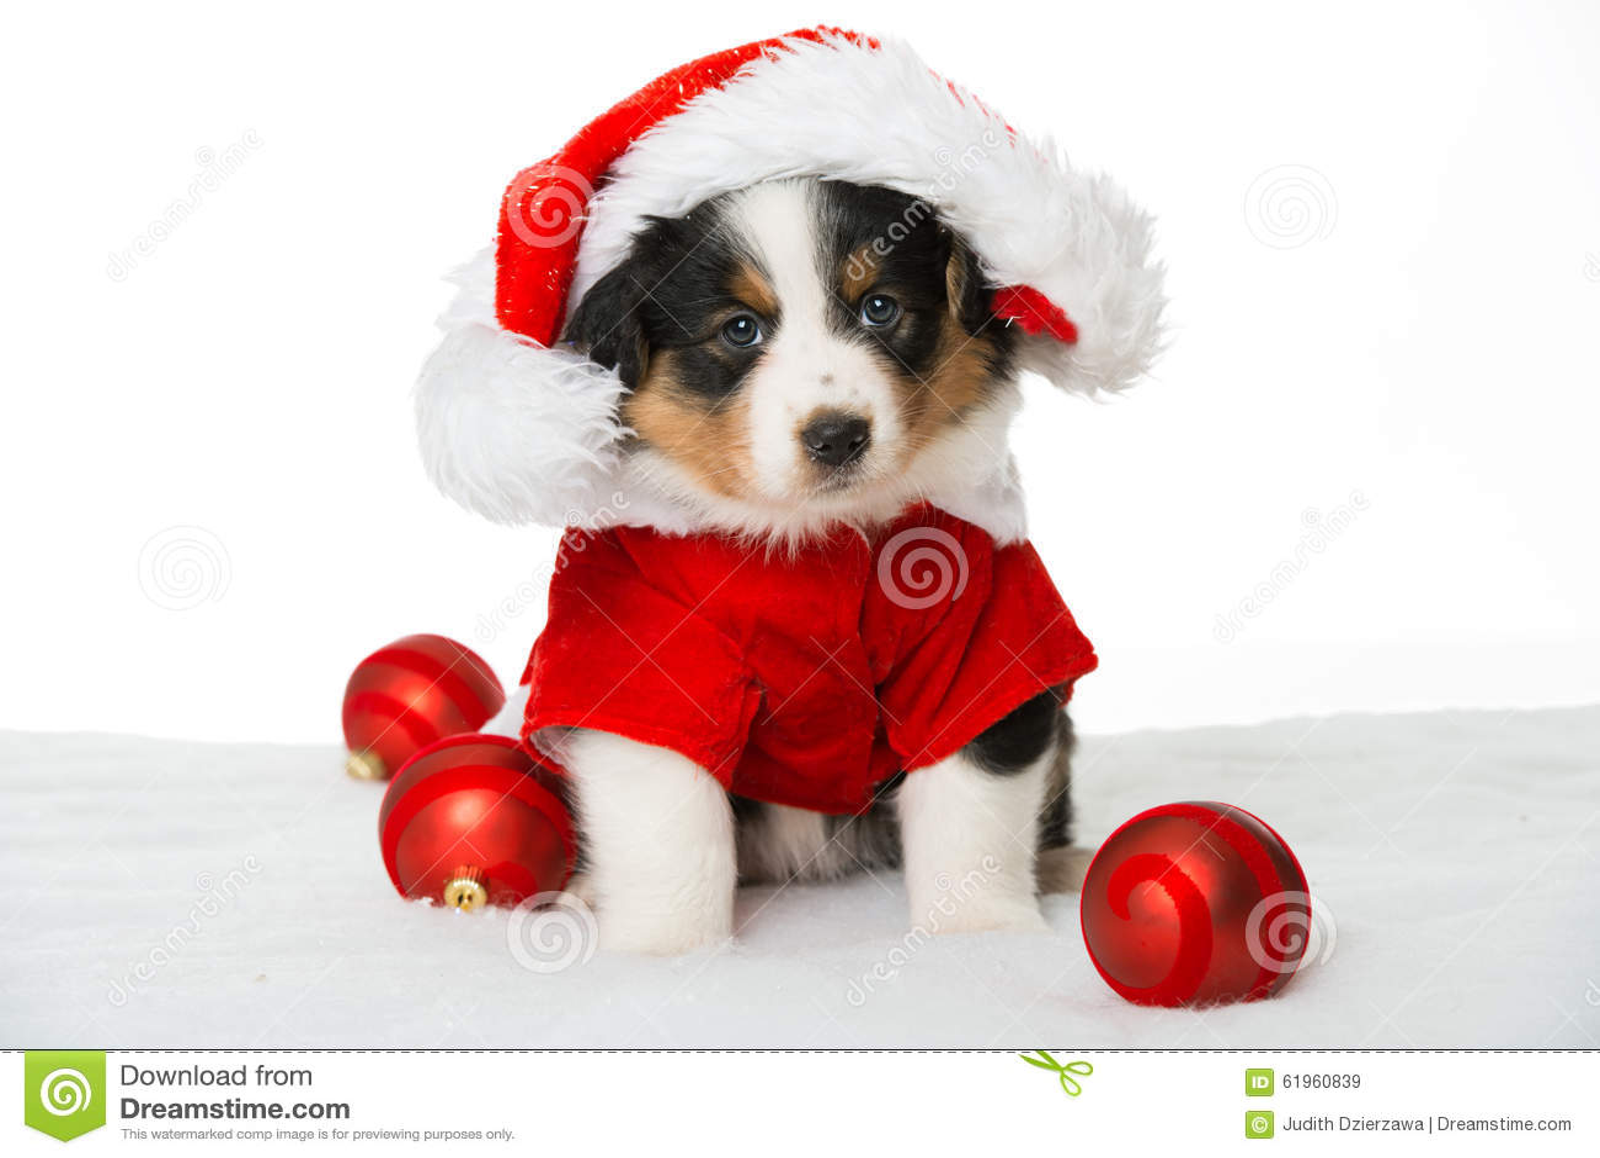 Christmas Puppy Stock Photo - Image: 61960839